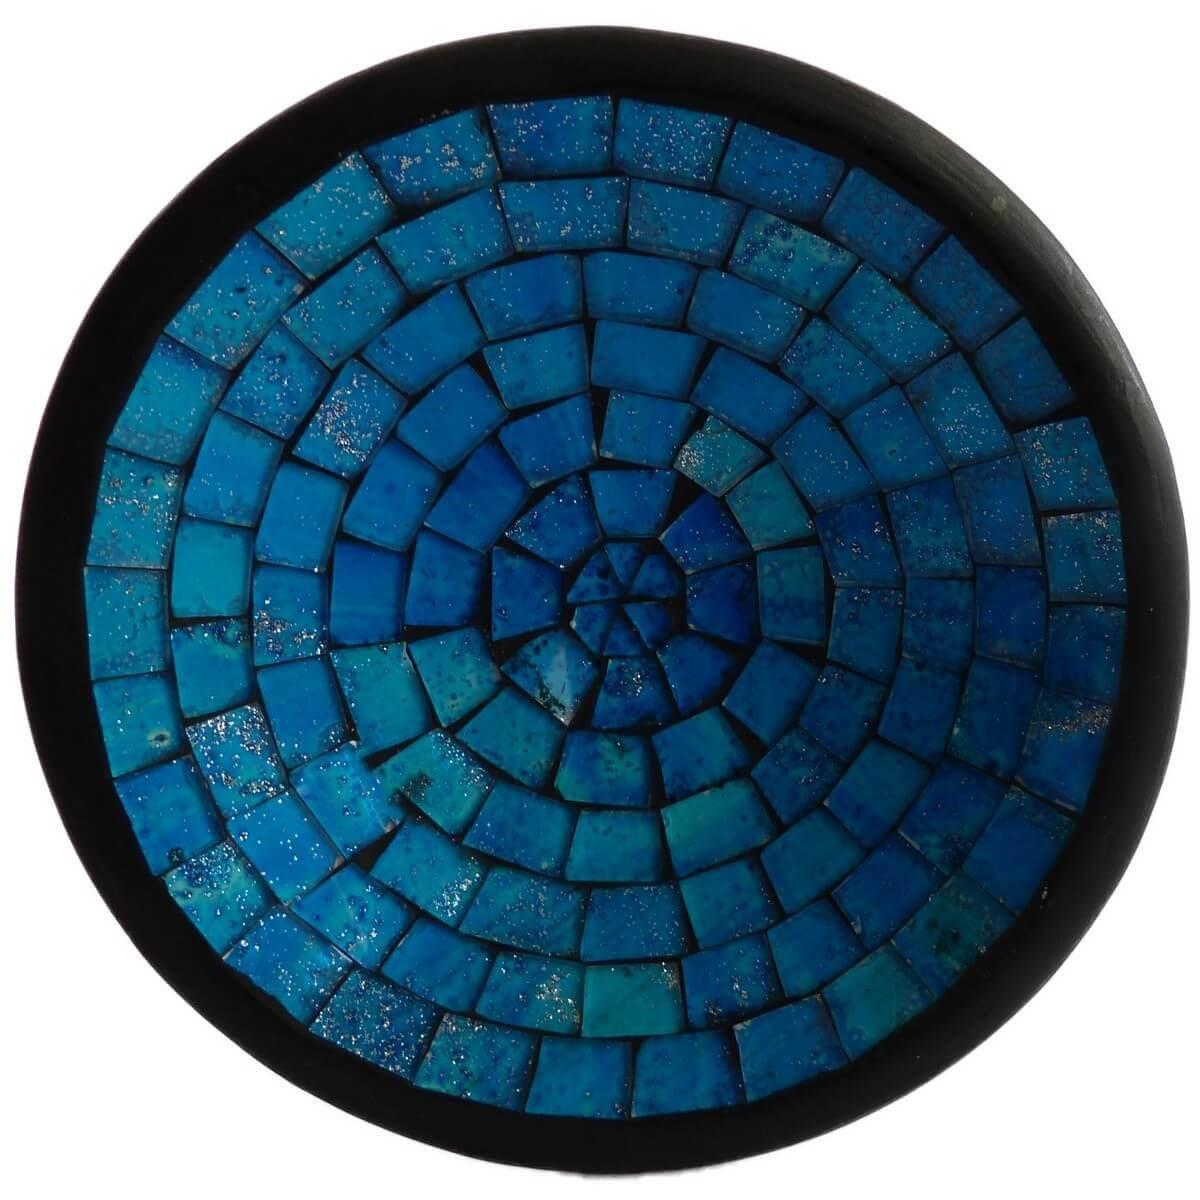 mosaikschale tonschale glasschale dekoschale mosaik kunst deko rund s ebay. Black Bedroom Furniture Sets. Home Design Ideas